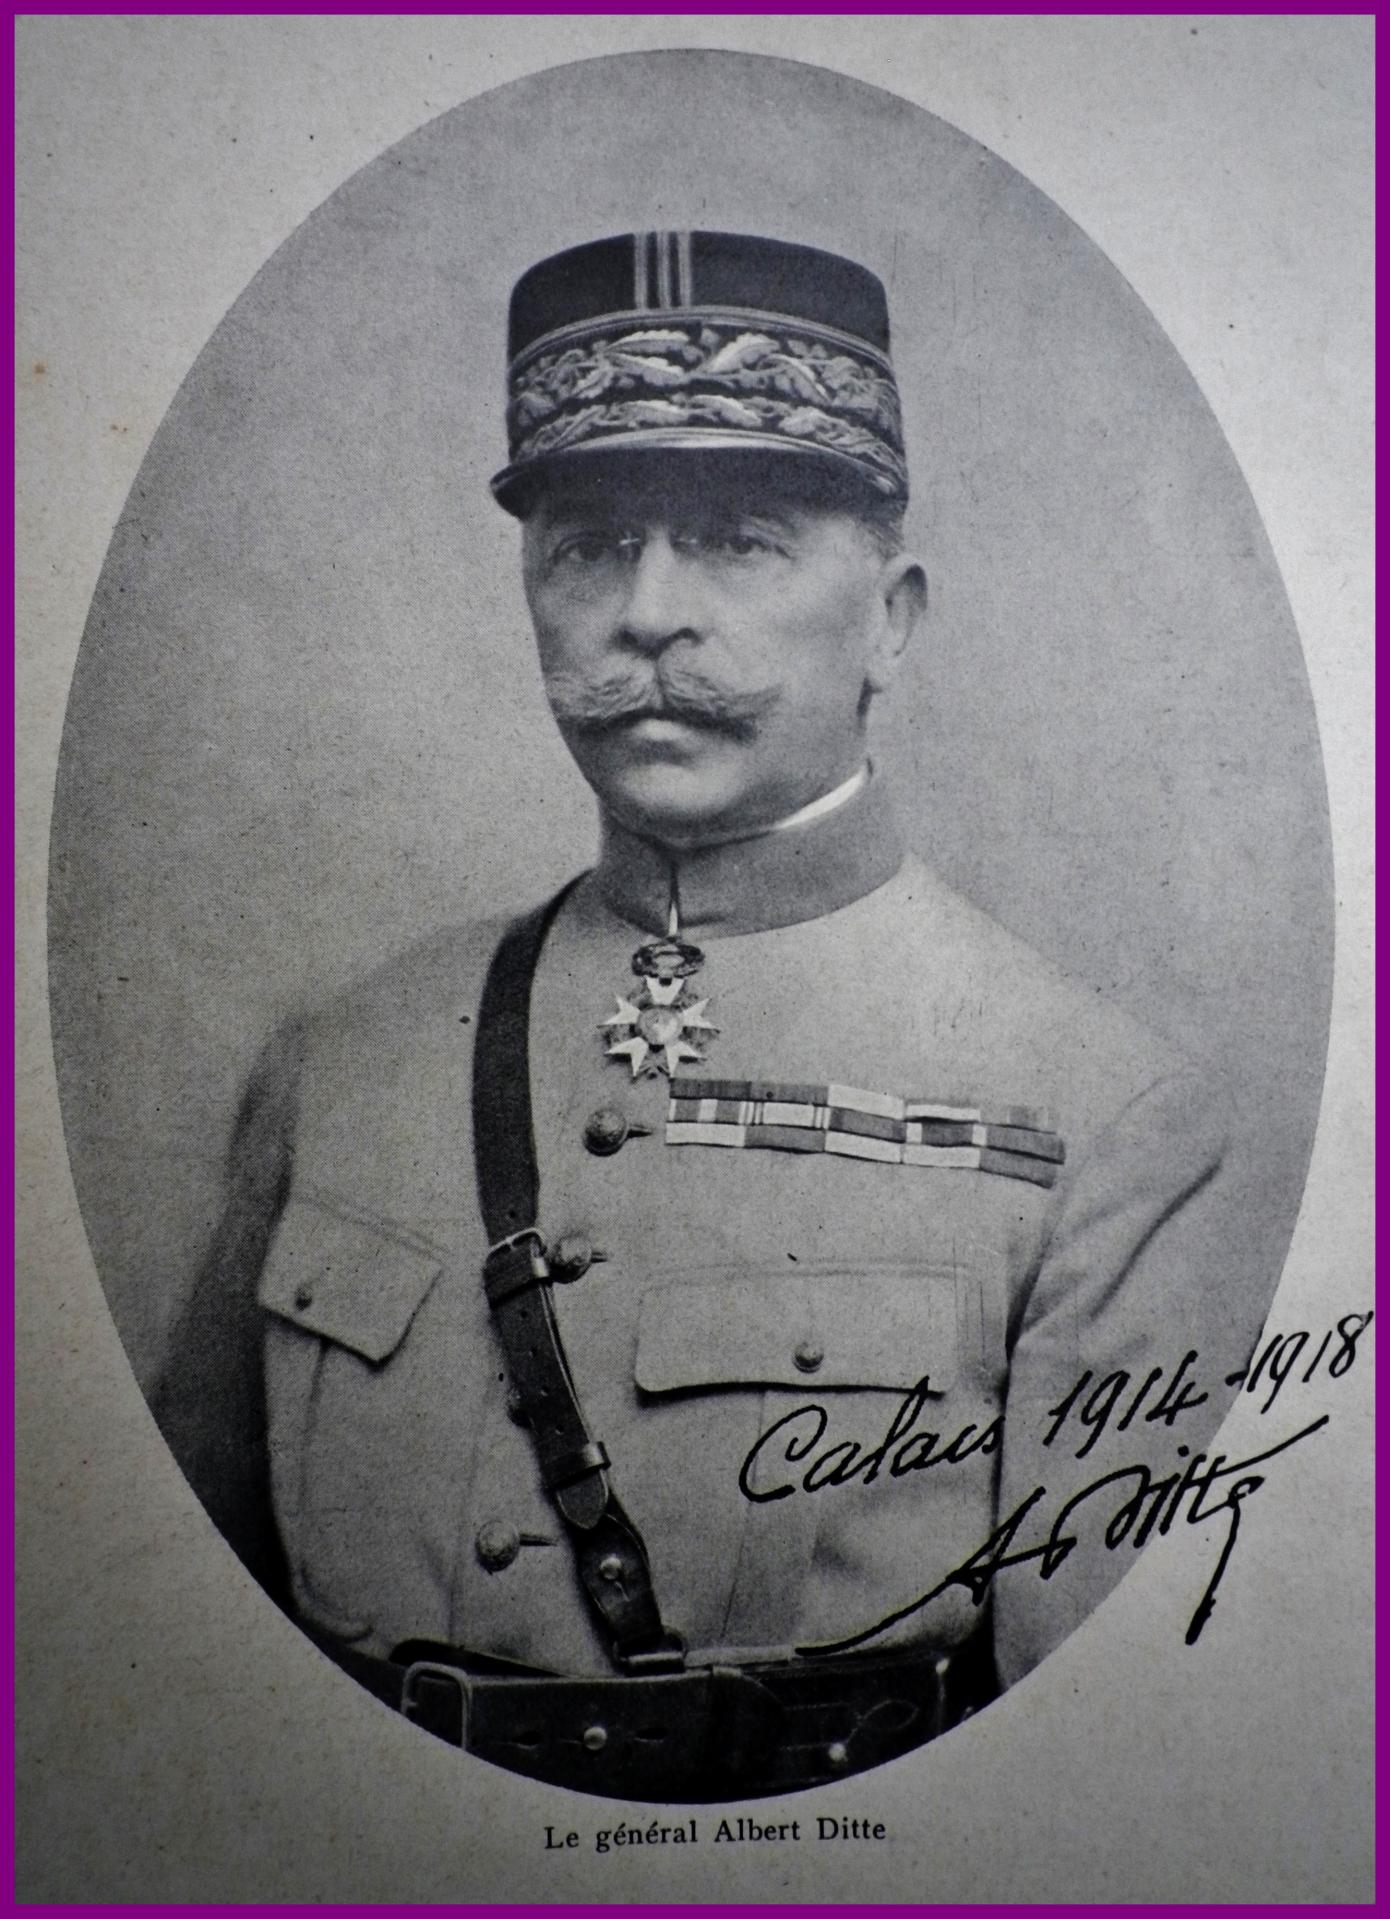 Calais 14 18 general ditte gouverneur de calais de 1914 a 1918 encadre